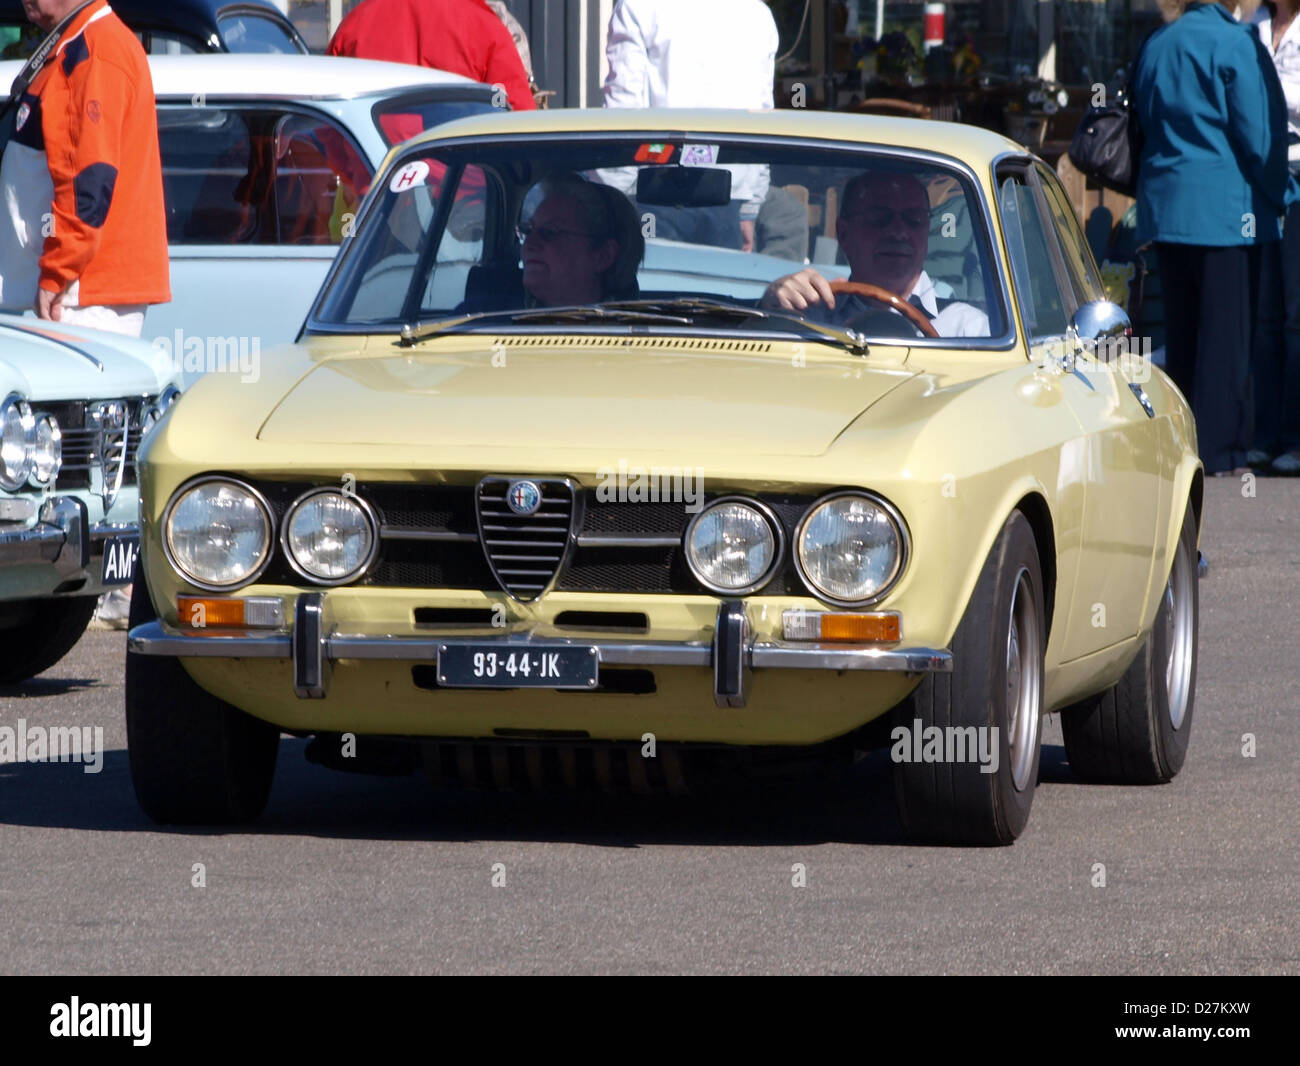 Alfa romeo 1750 gtv car classics - 1969 Alfa Romeo 1750 Gtv